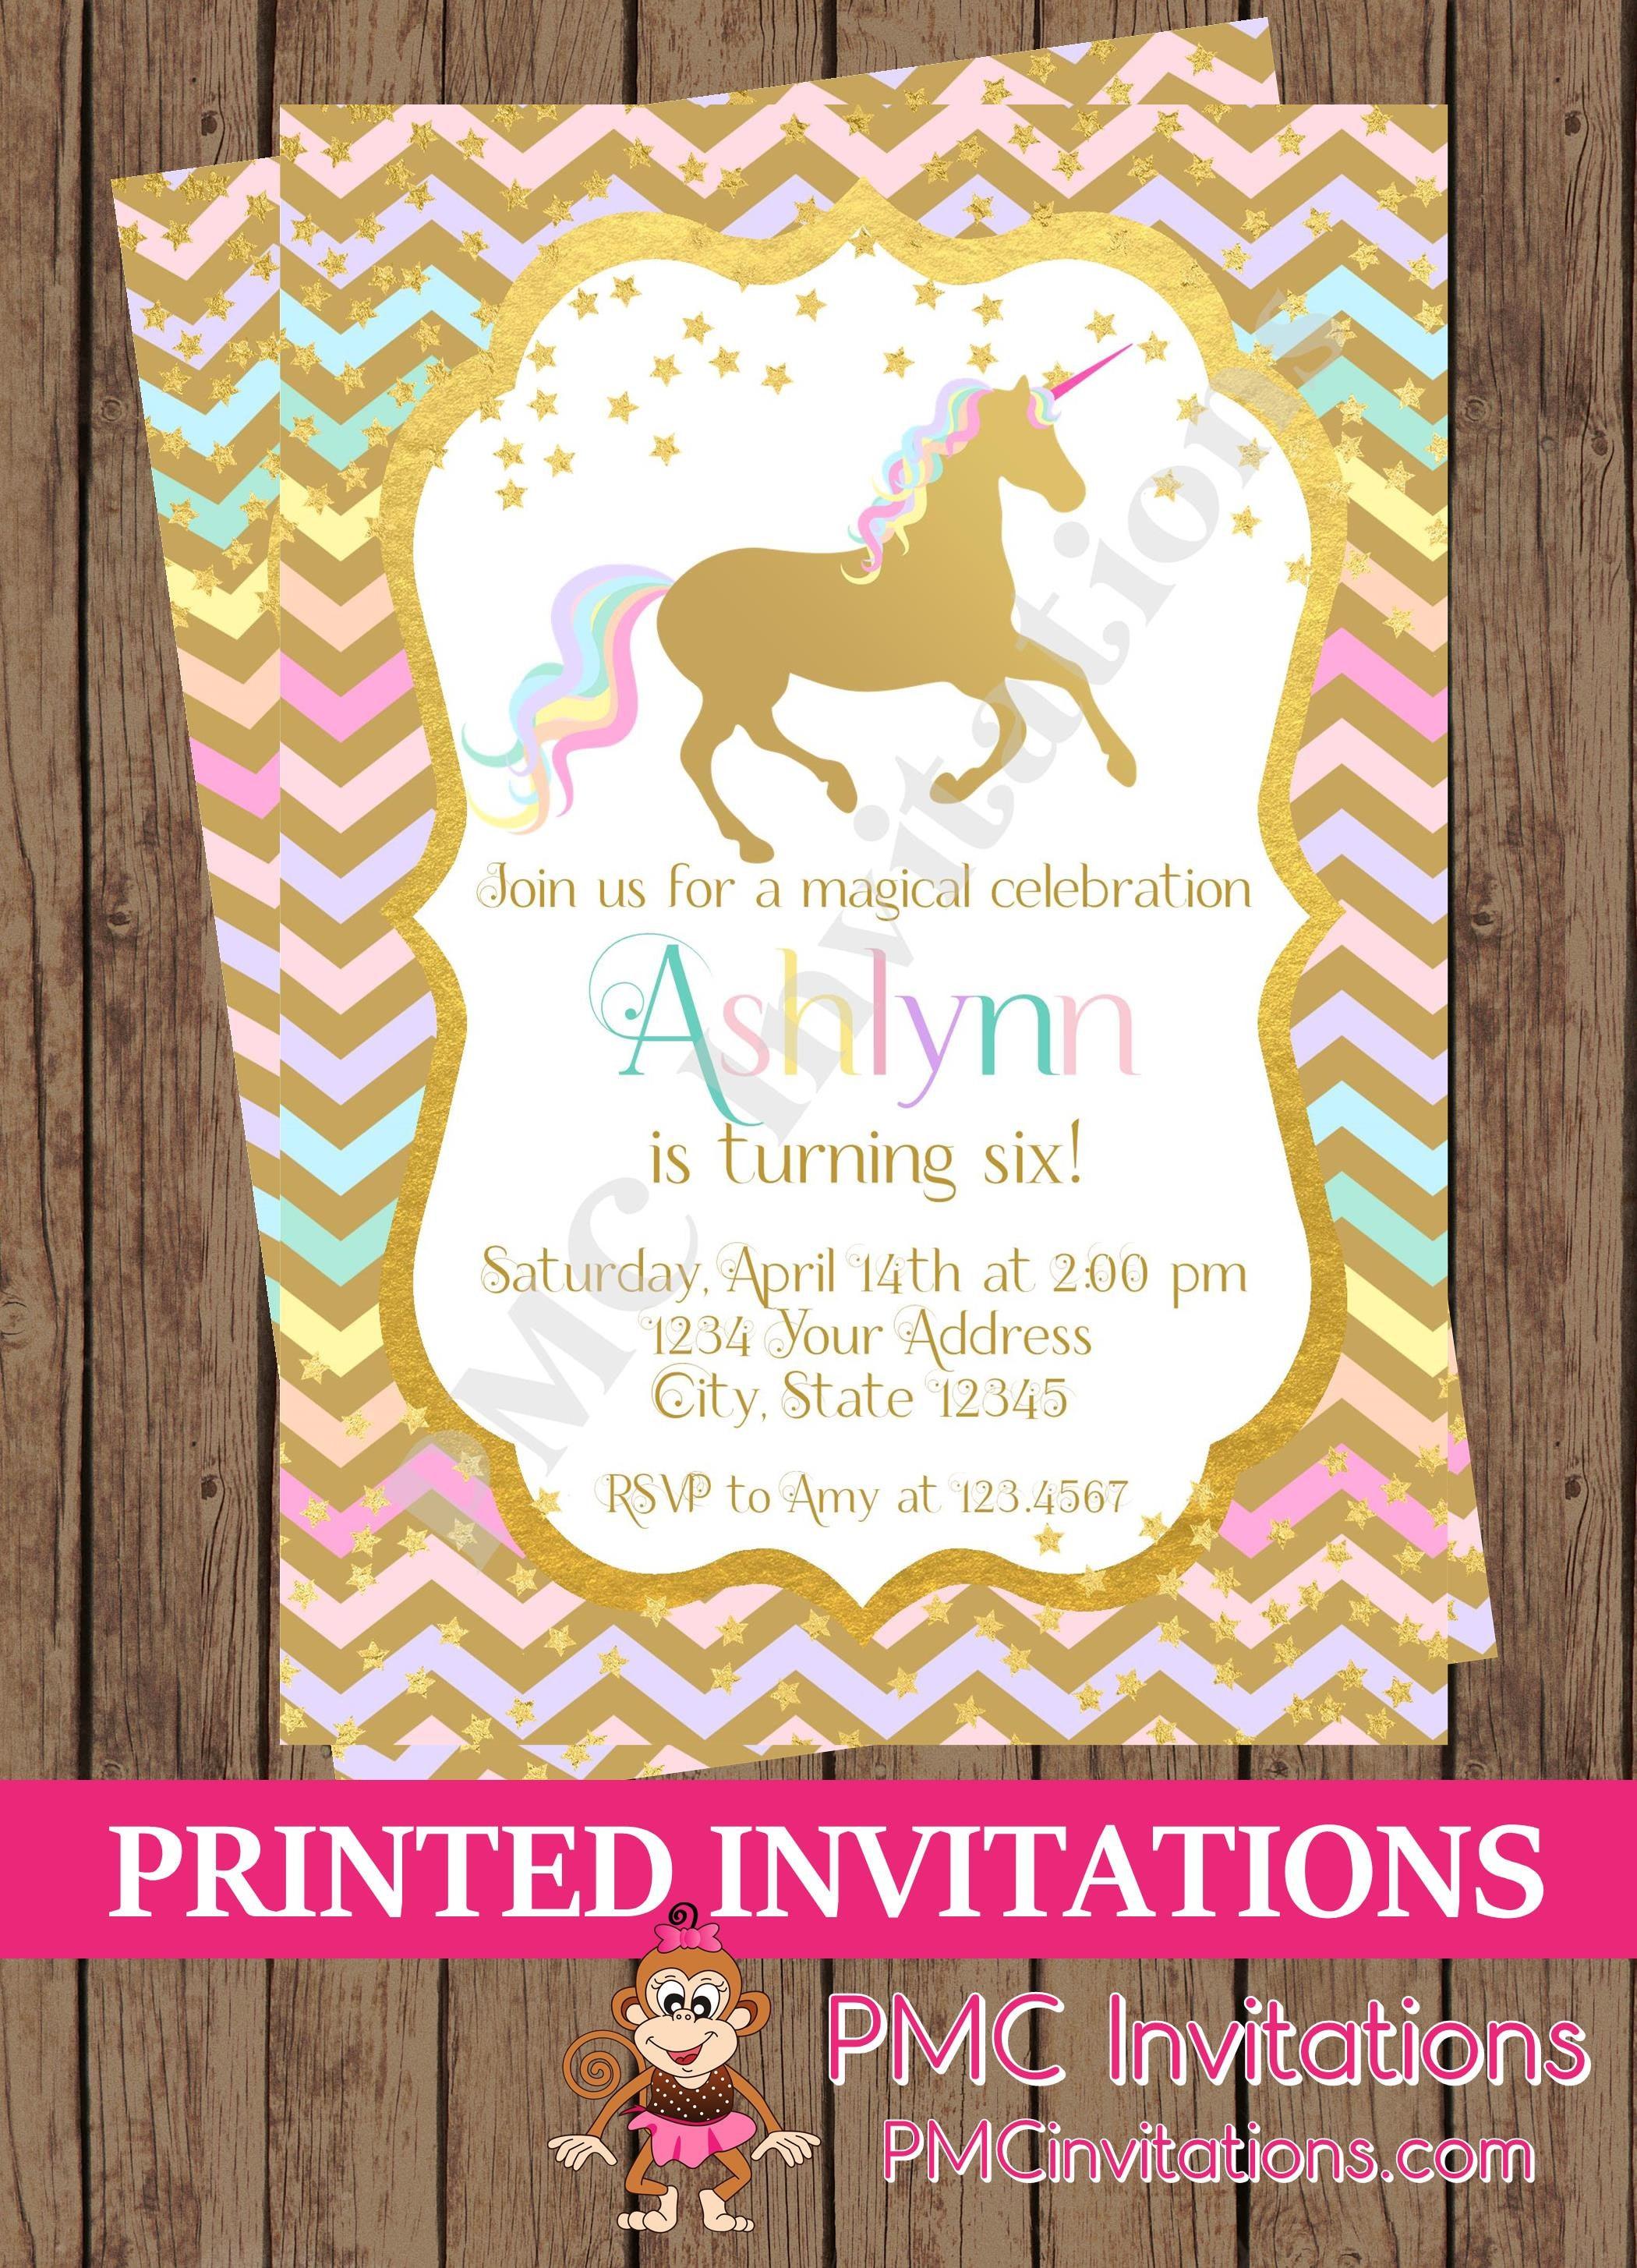 Custom PRINTED Unicorn Birthday Invitation Unicorn Silhouette